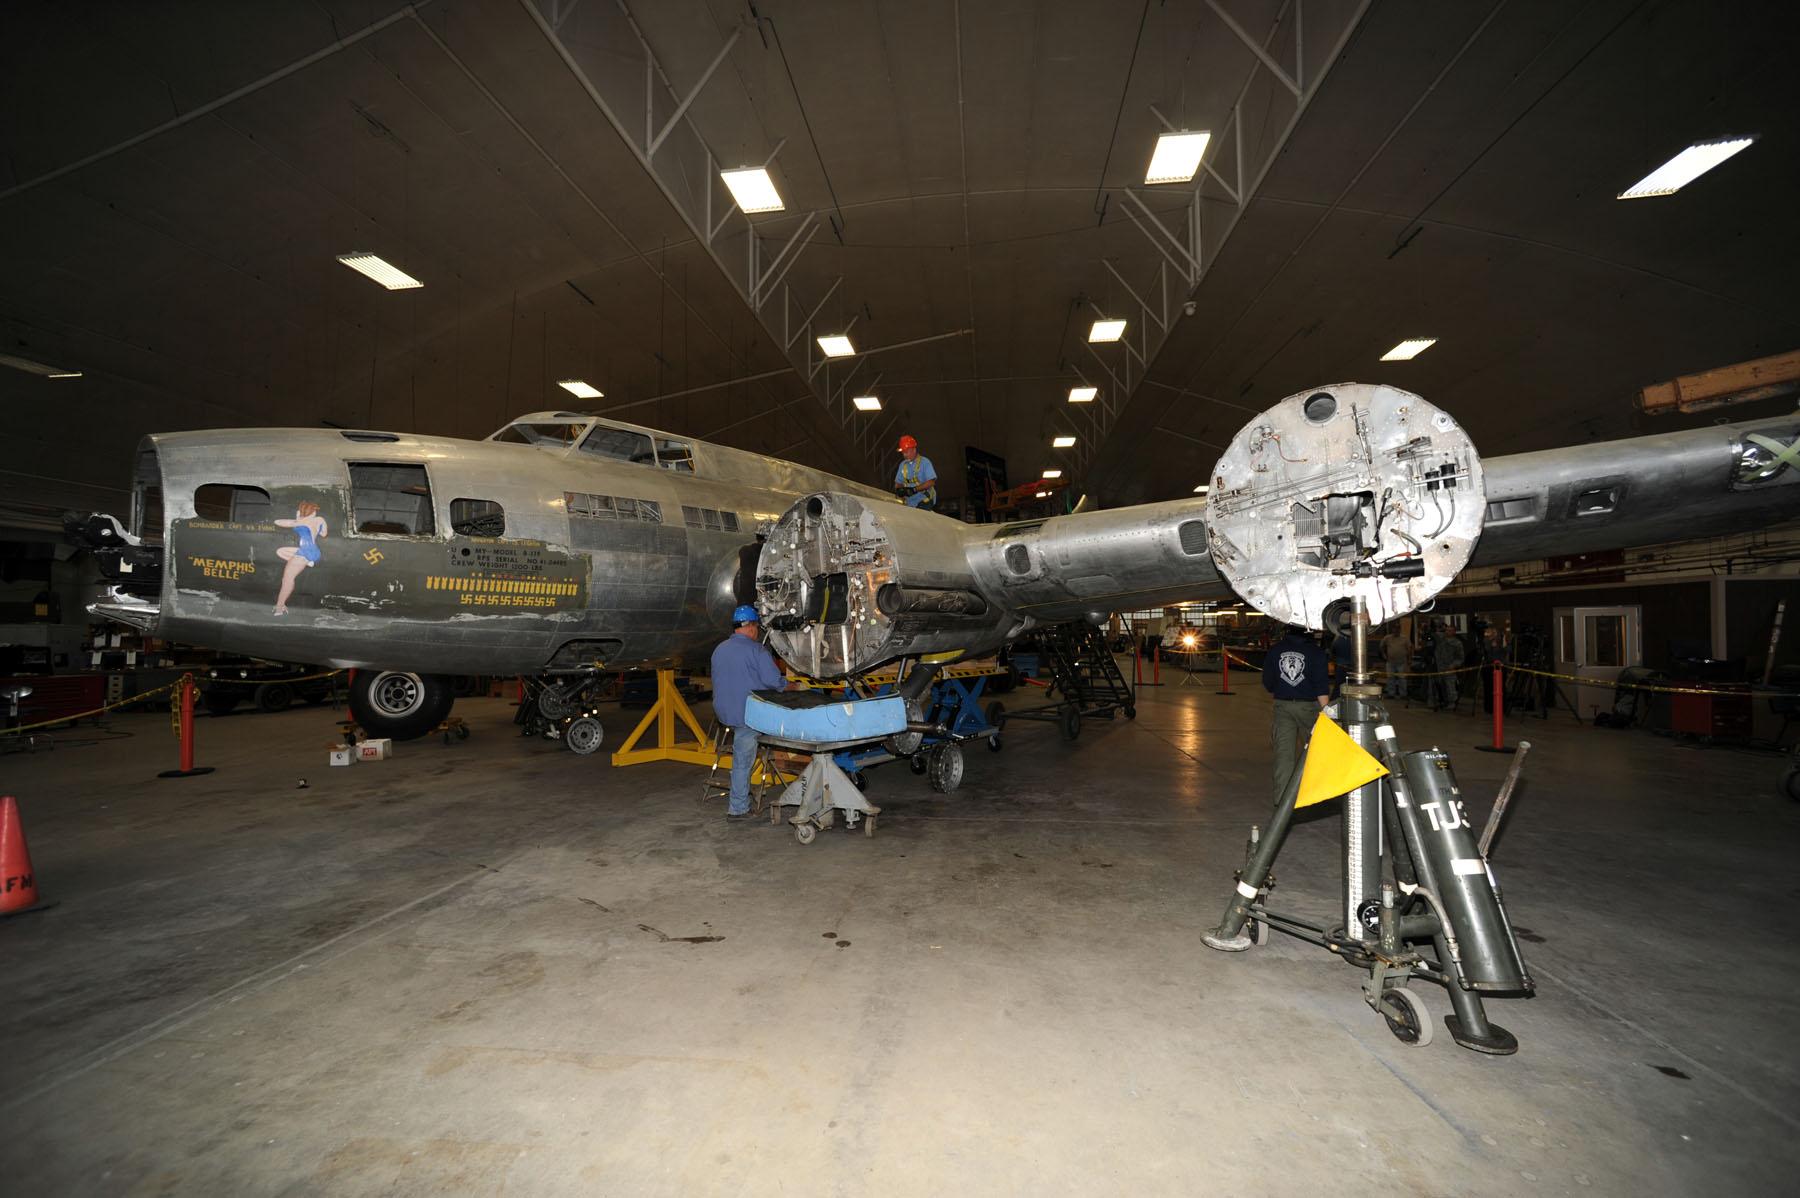 B-17 MEMPHIS BELLE UNDERGOES RESTORATION MILESTONES